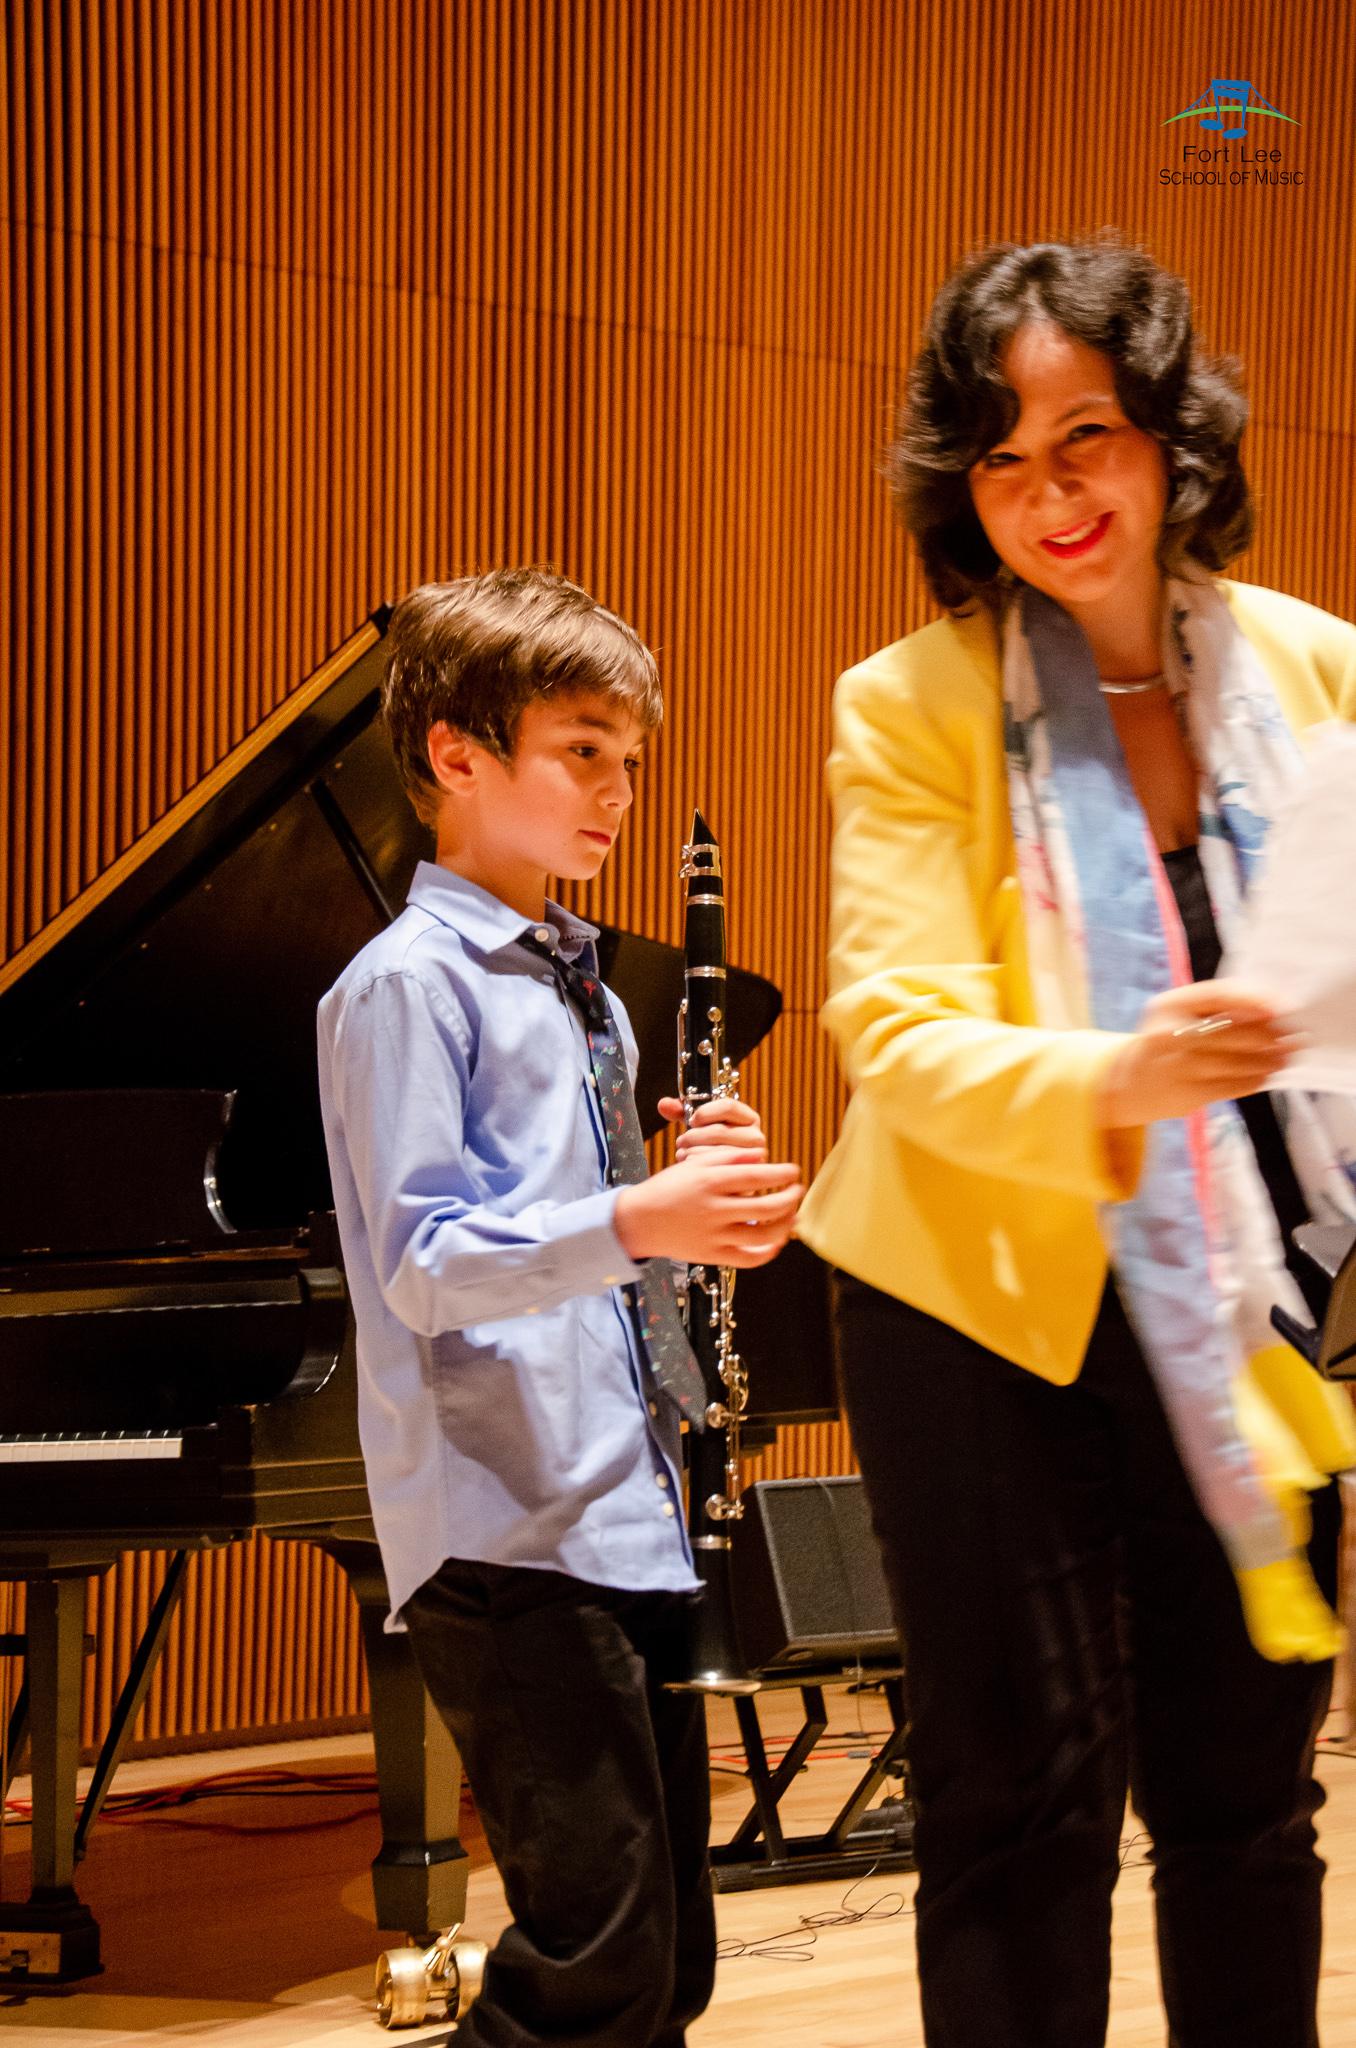 clarinet-lessons-near-me.jpg